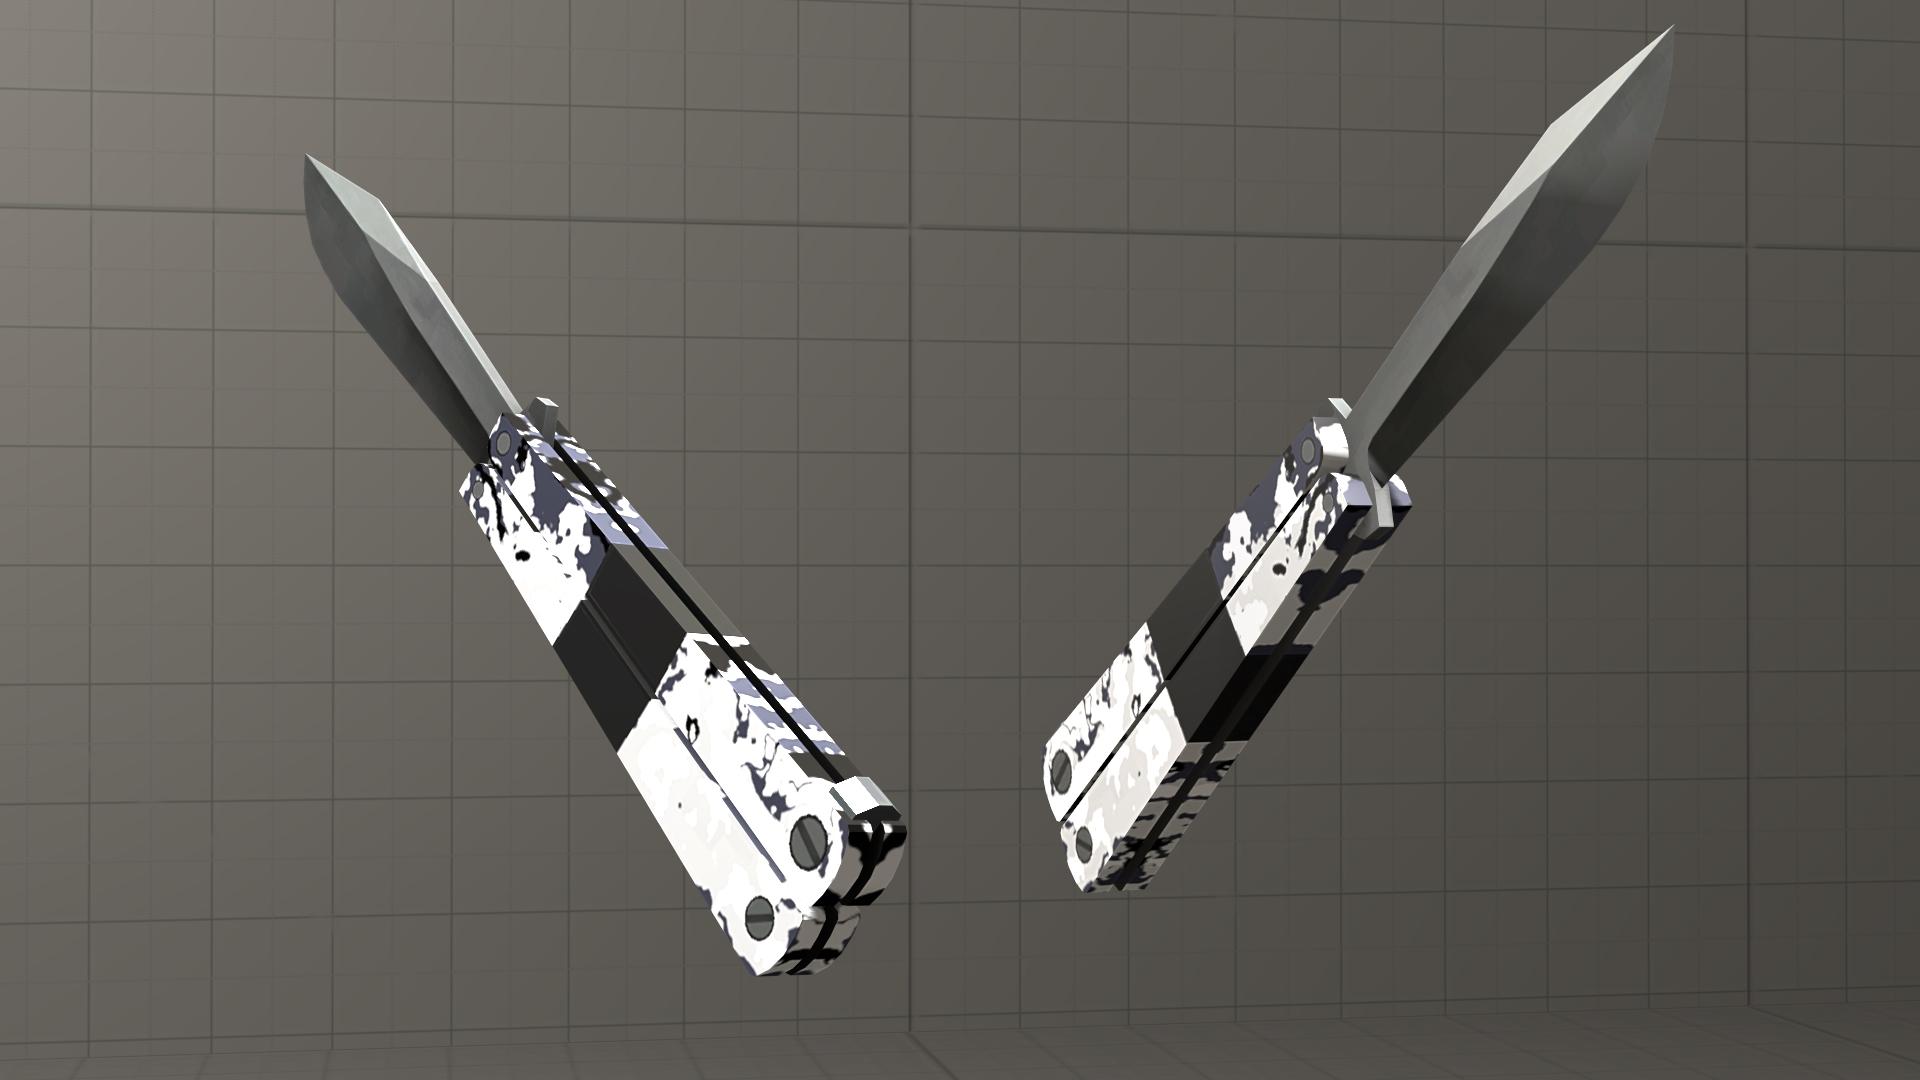 Artic spy Knife [DL] by Nikolad92